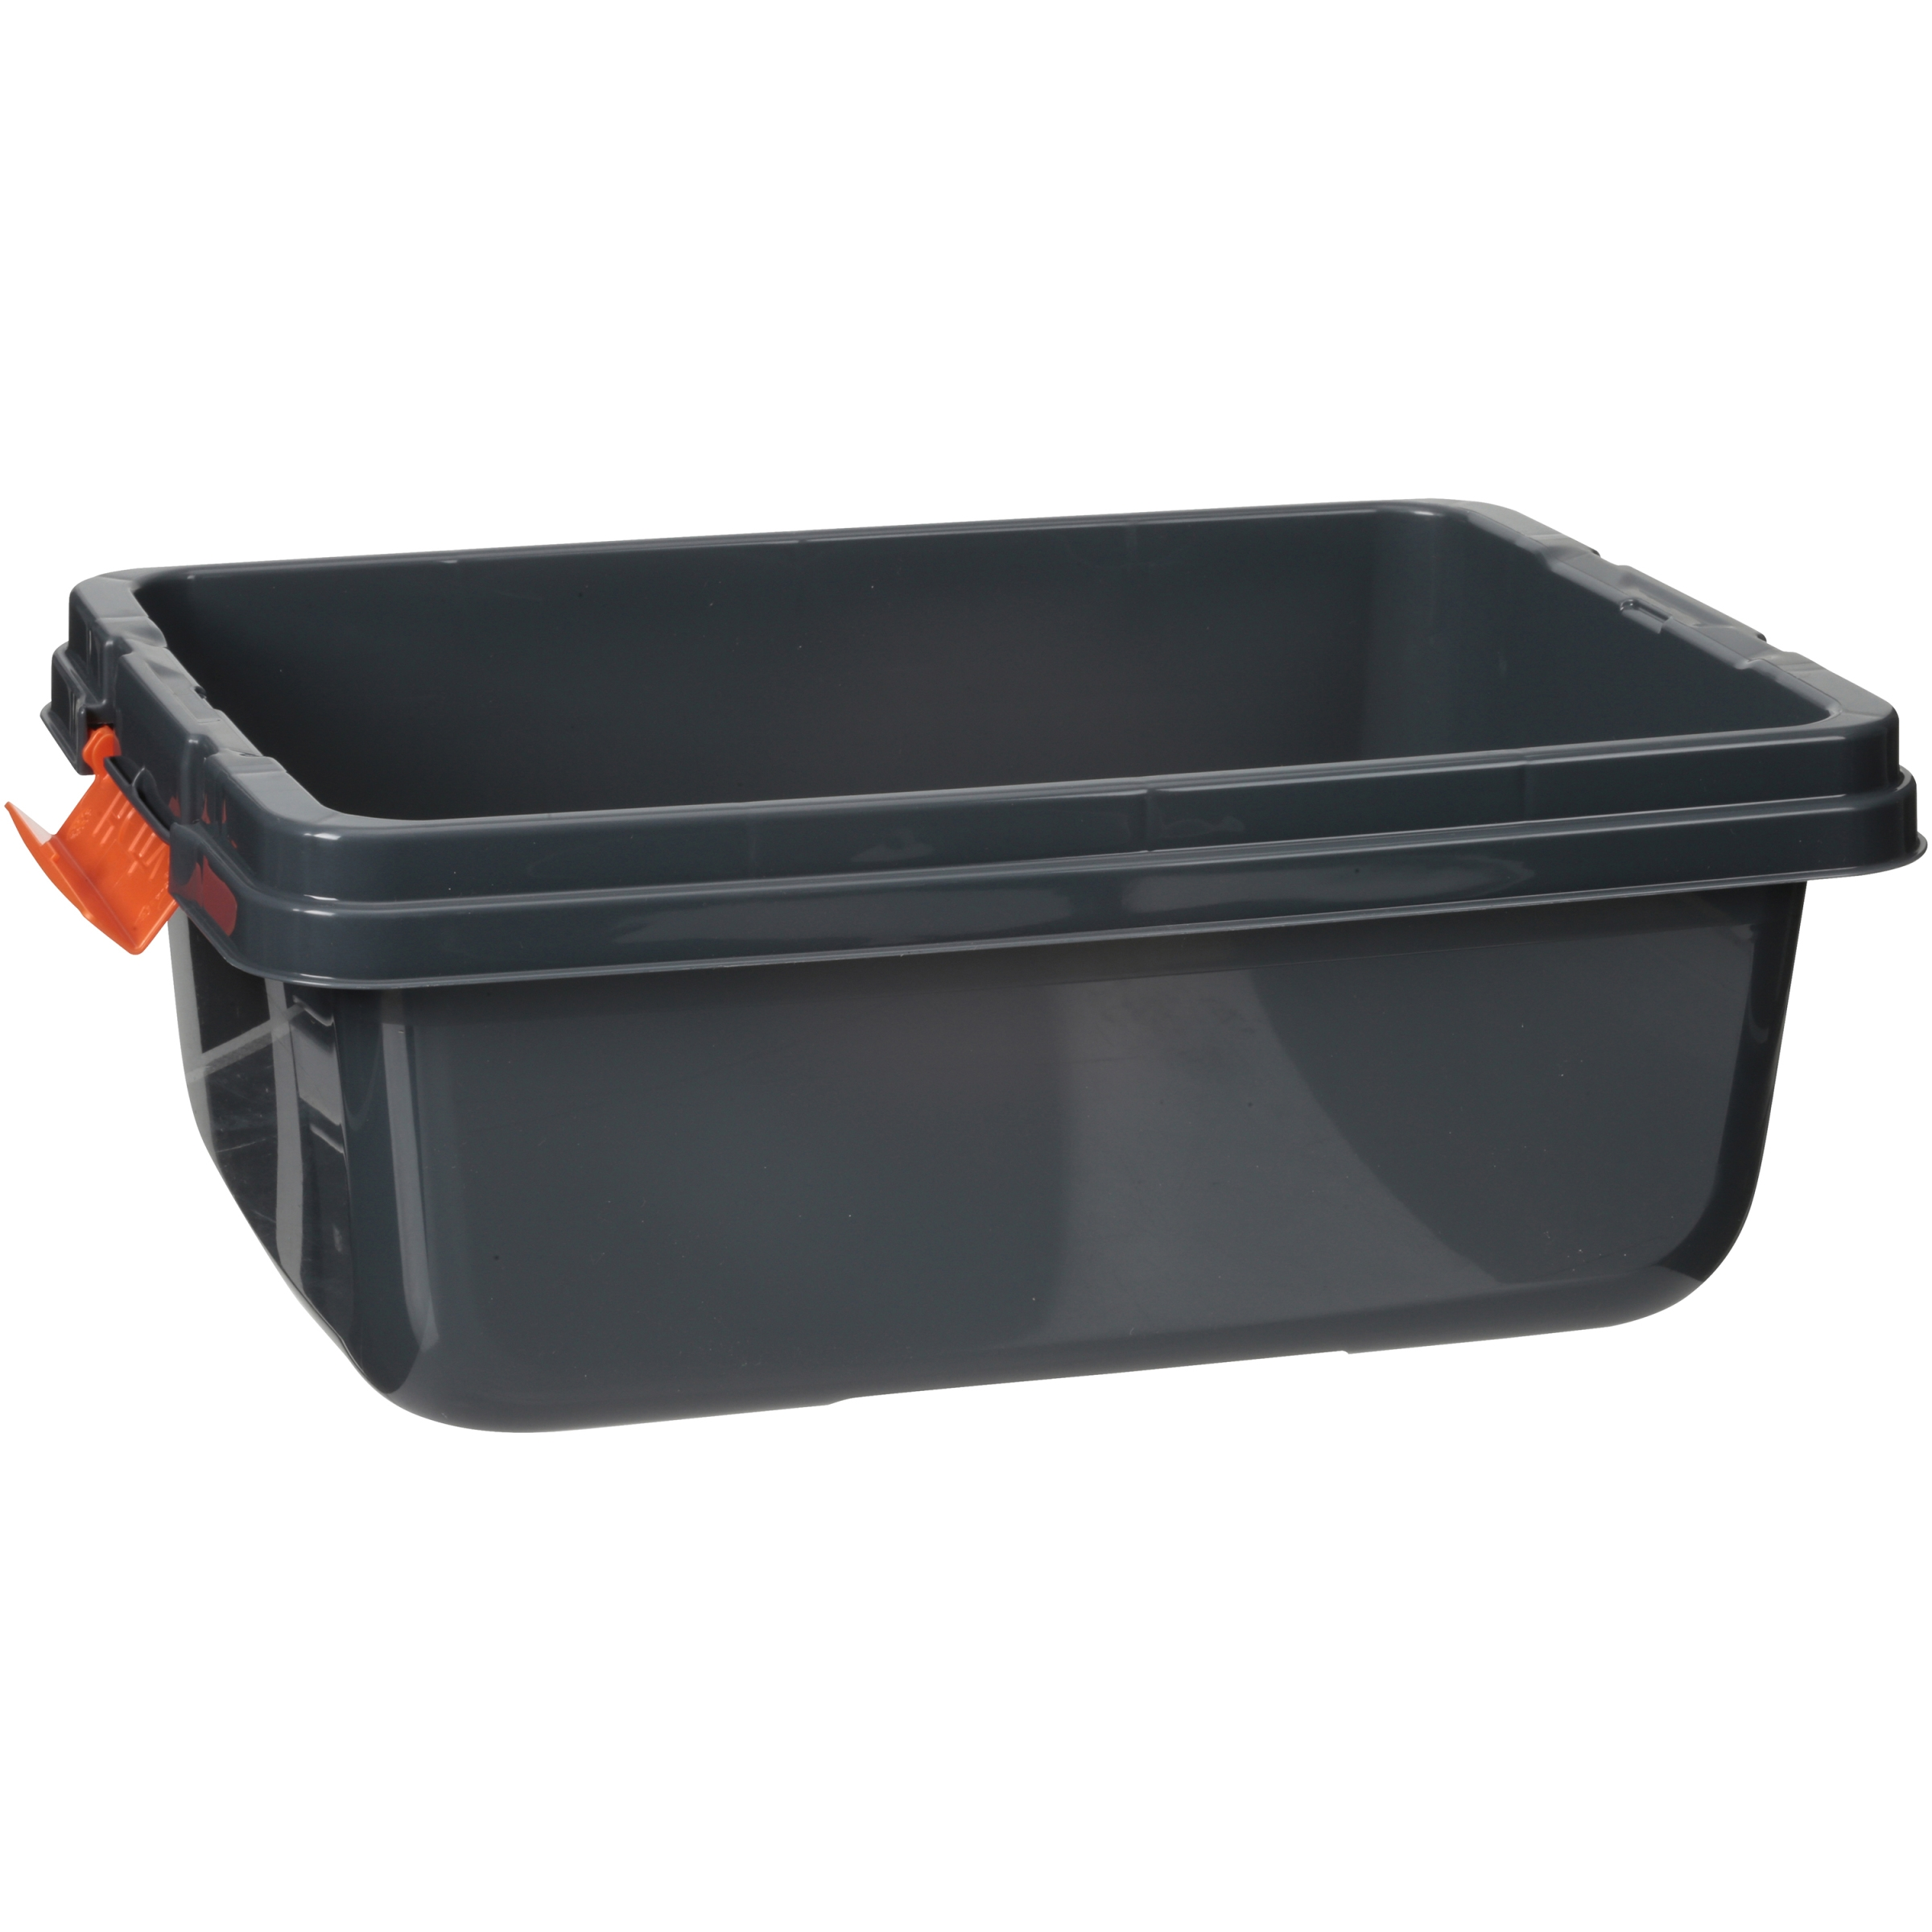 Hefty HI RISE Heavy Duty Storage Bins 18 Qt Latch Storage Box